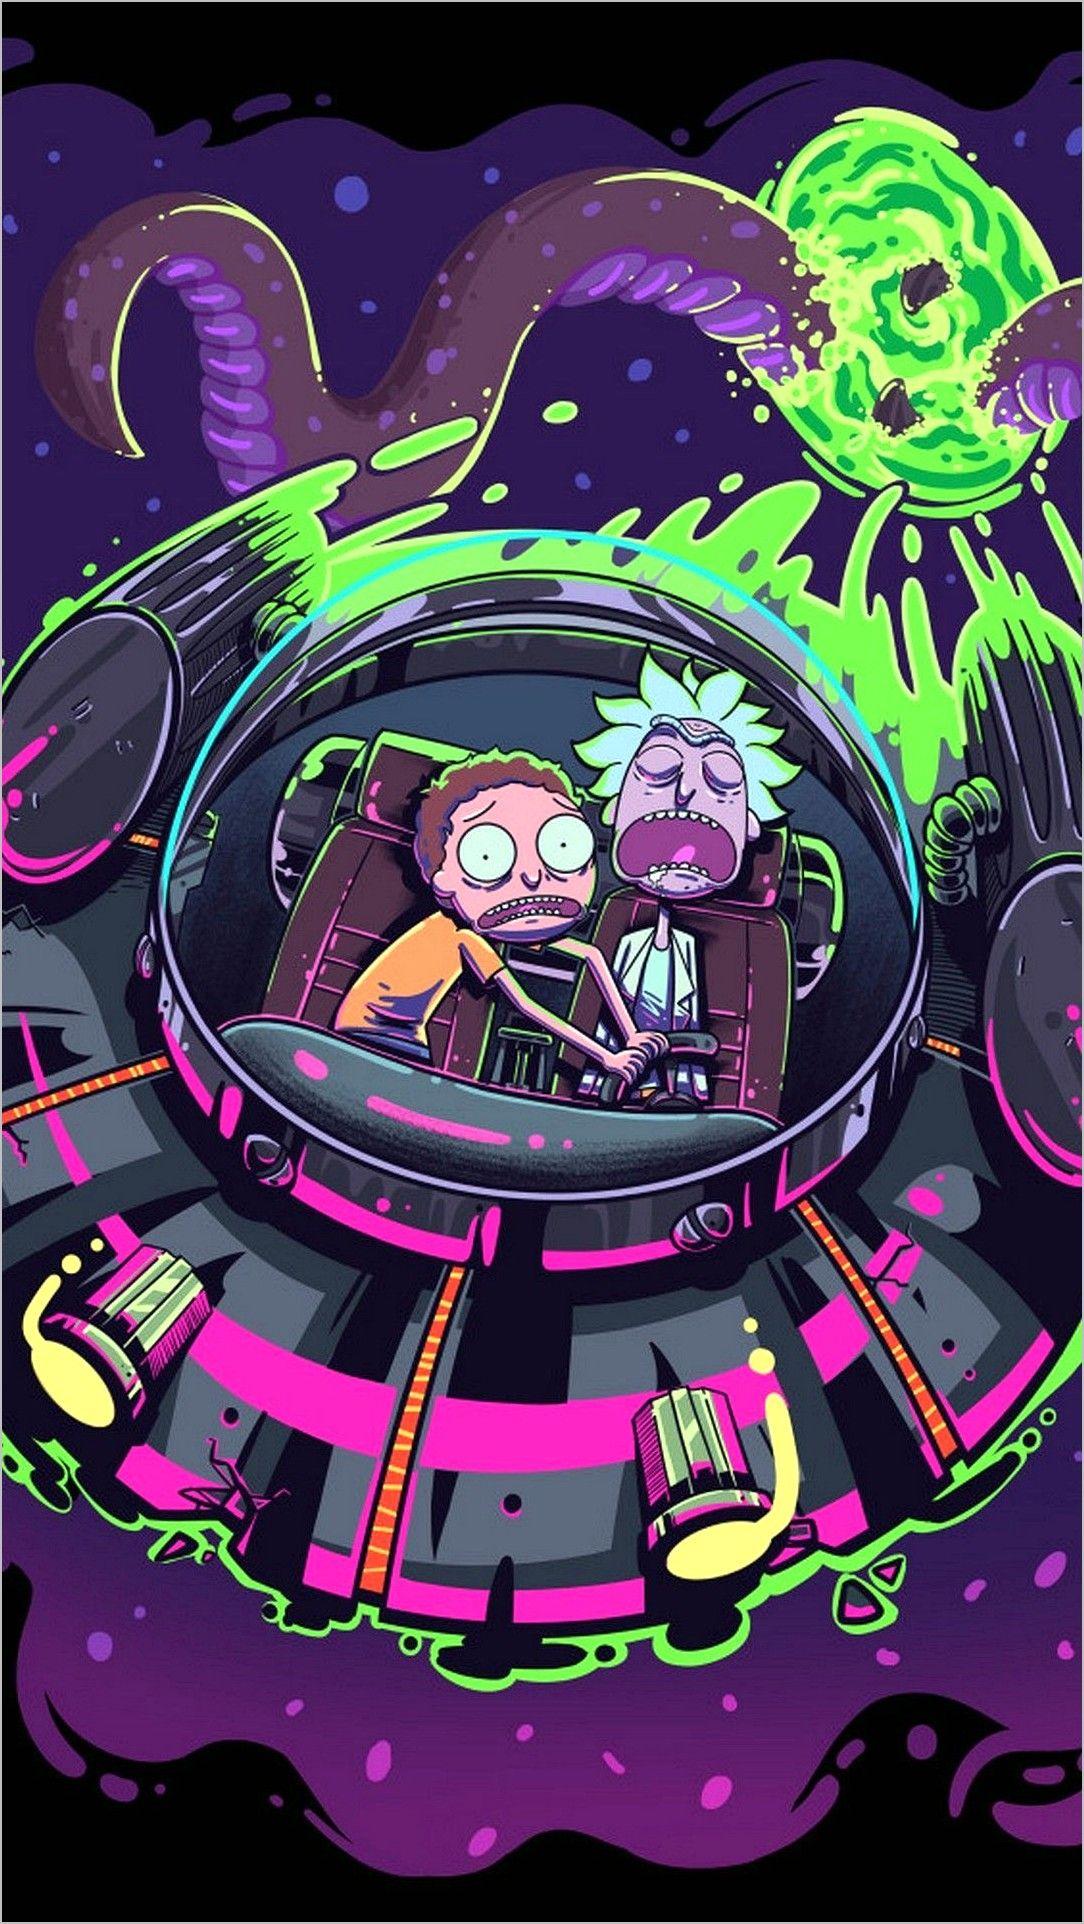 Wallpapers 4k Rick E Morty In 2020 Cartoon Wallpaper Trippy Wallpaper Anime Wallpaper